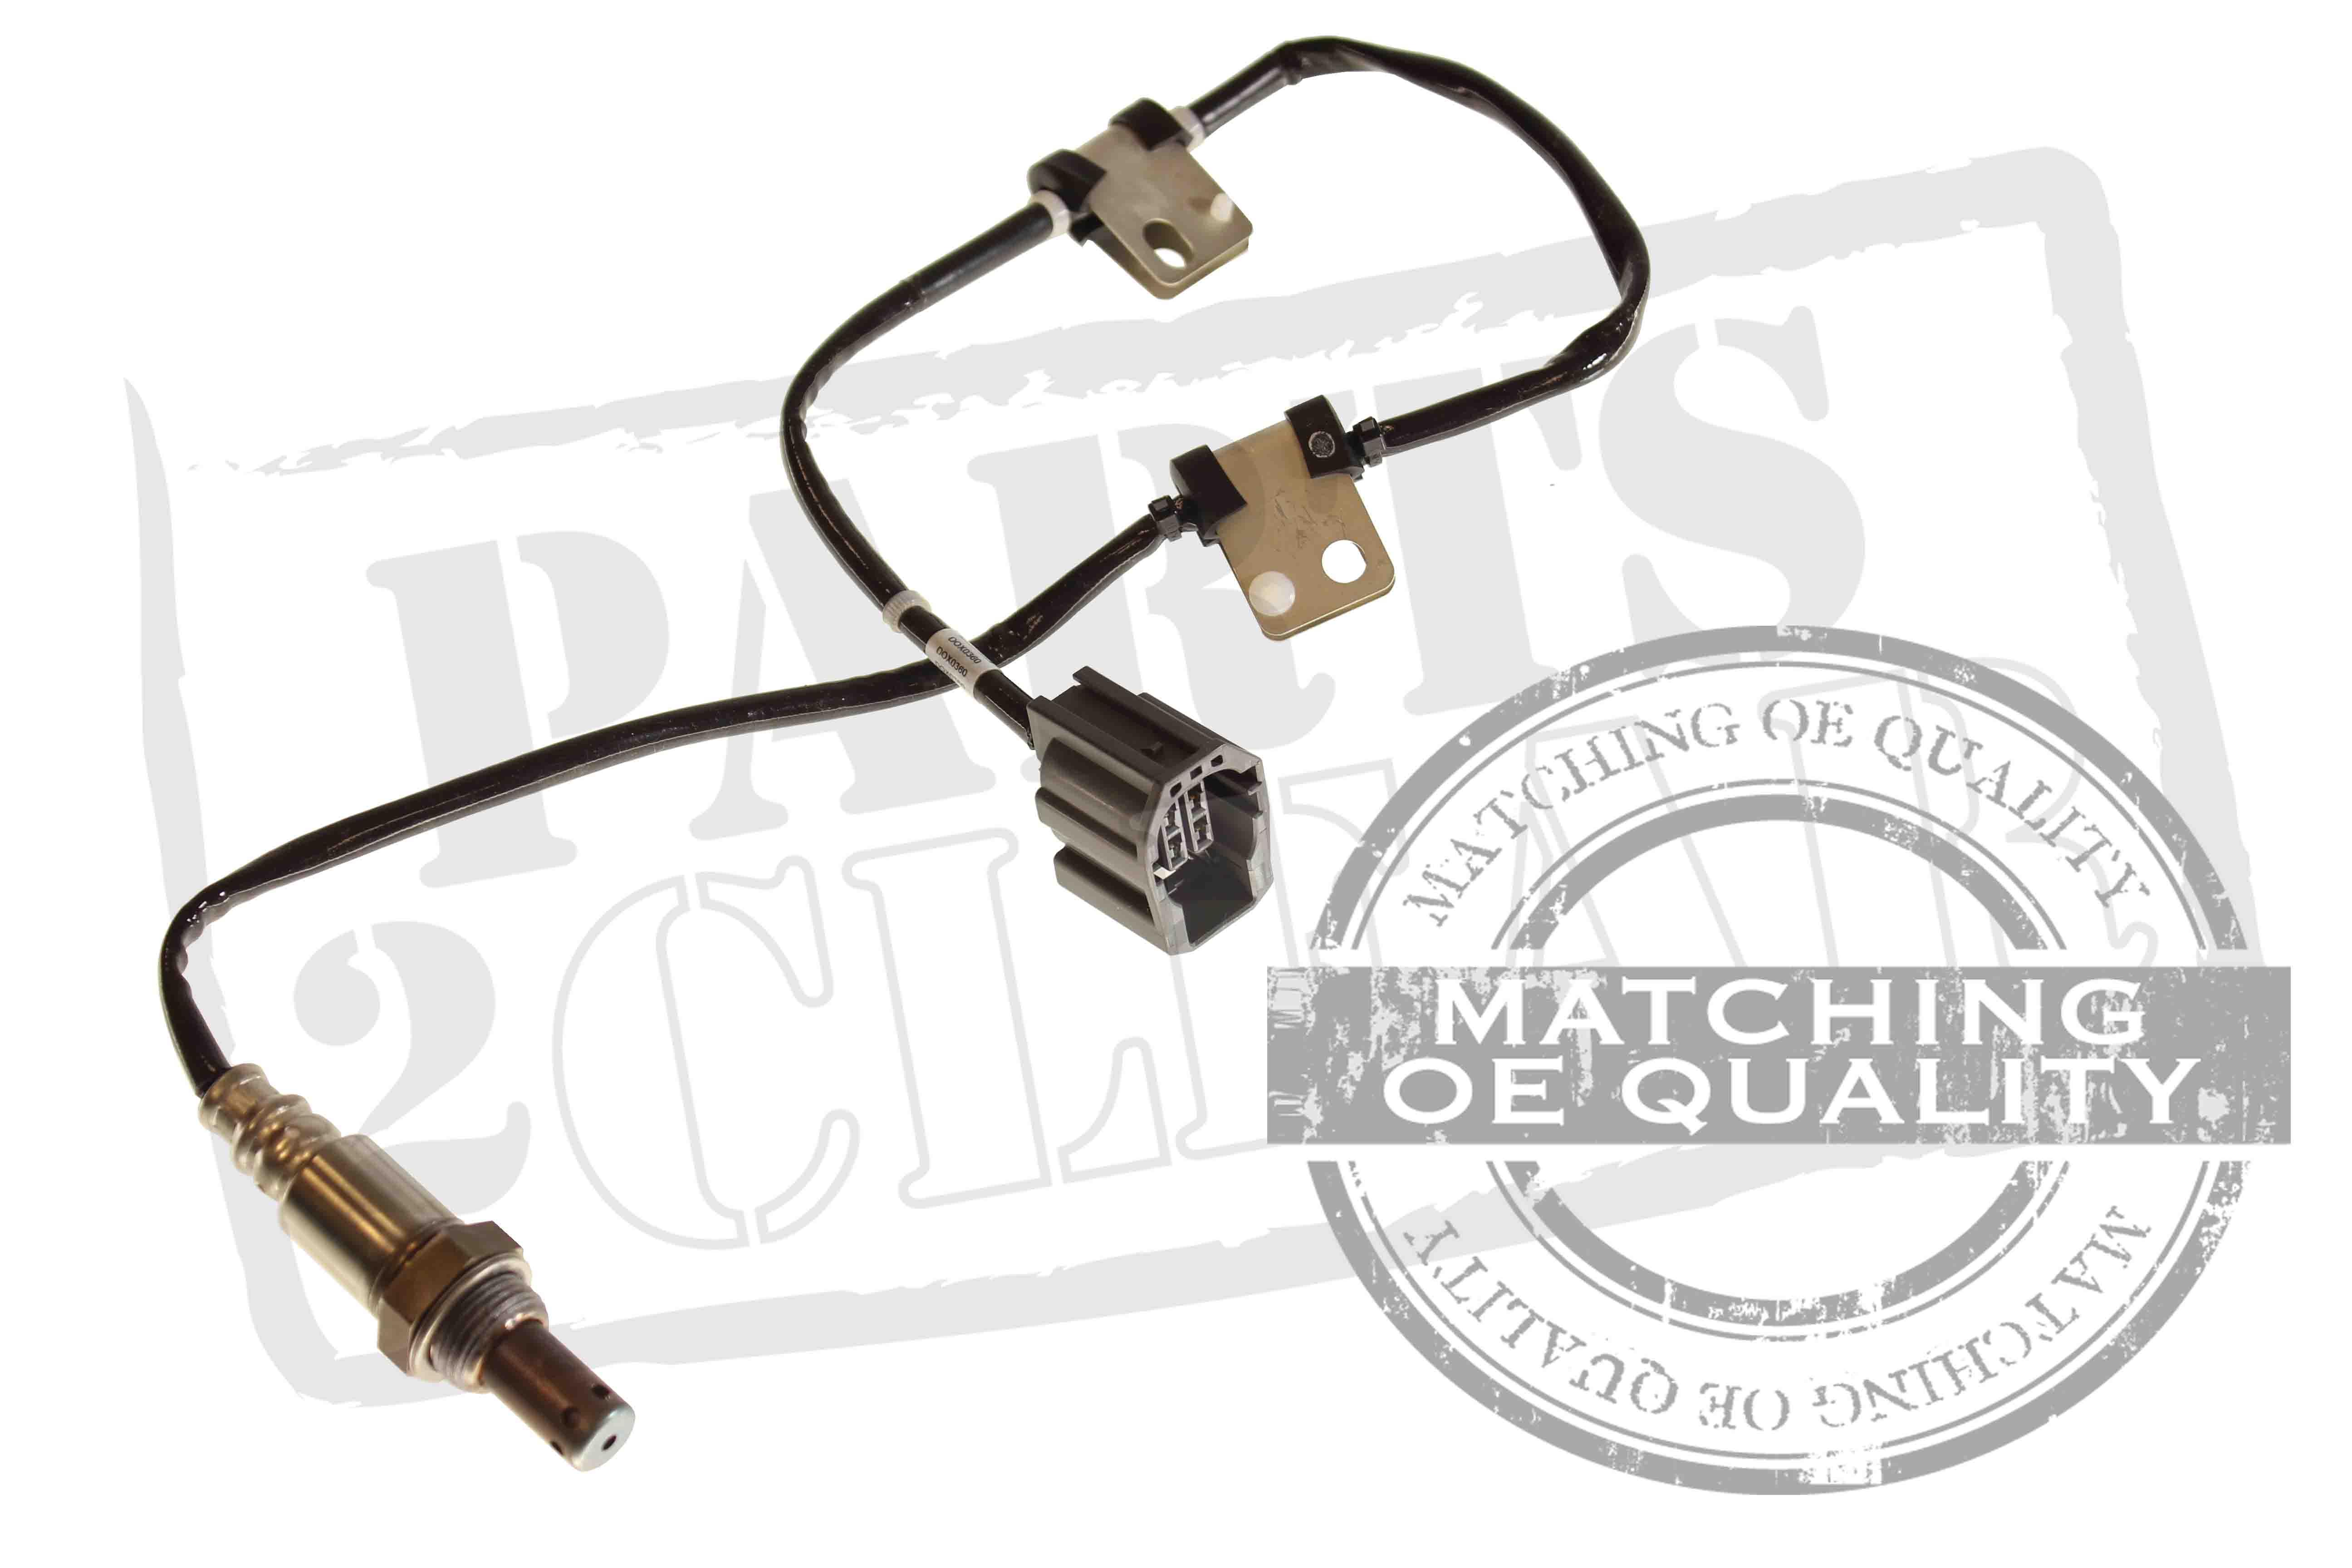 Hks Super Power Kit de filtro de inducción de flujo Recargado-para S14a 200SX Kouki SR20DET